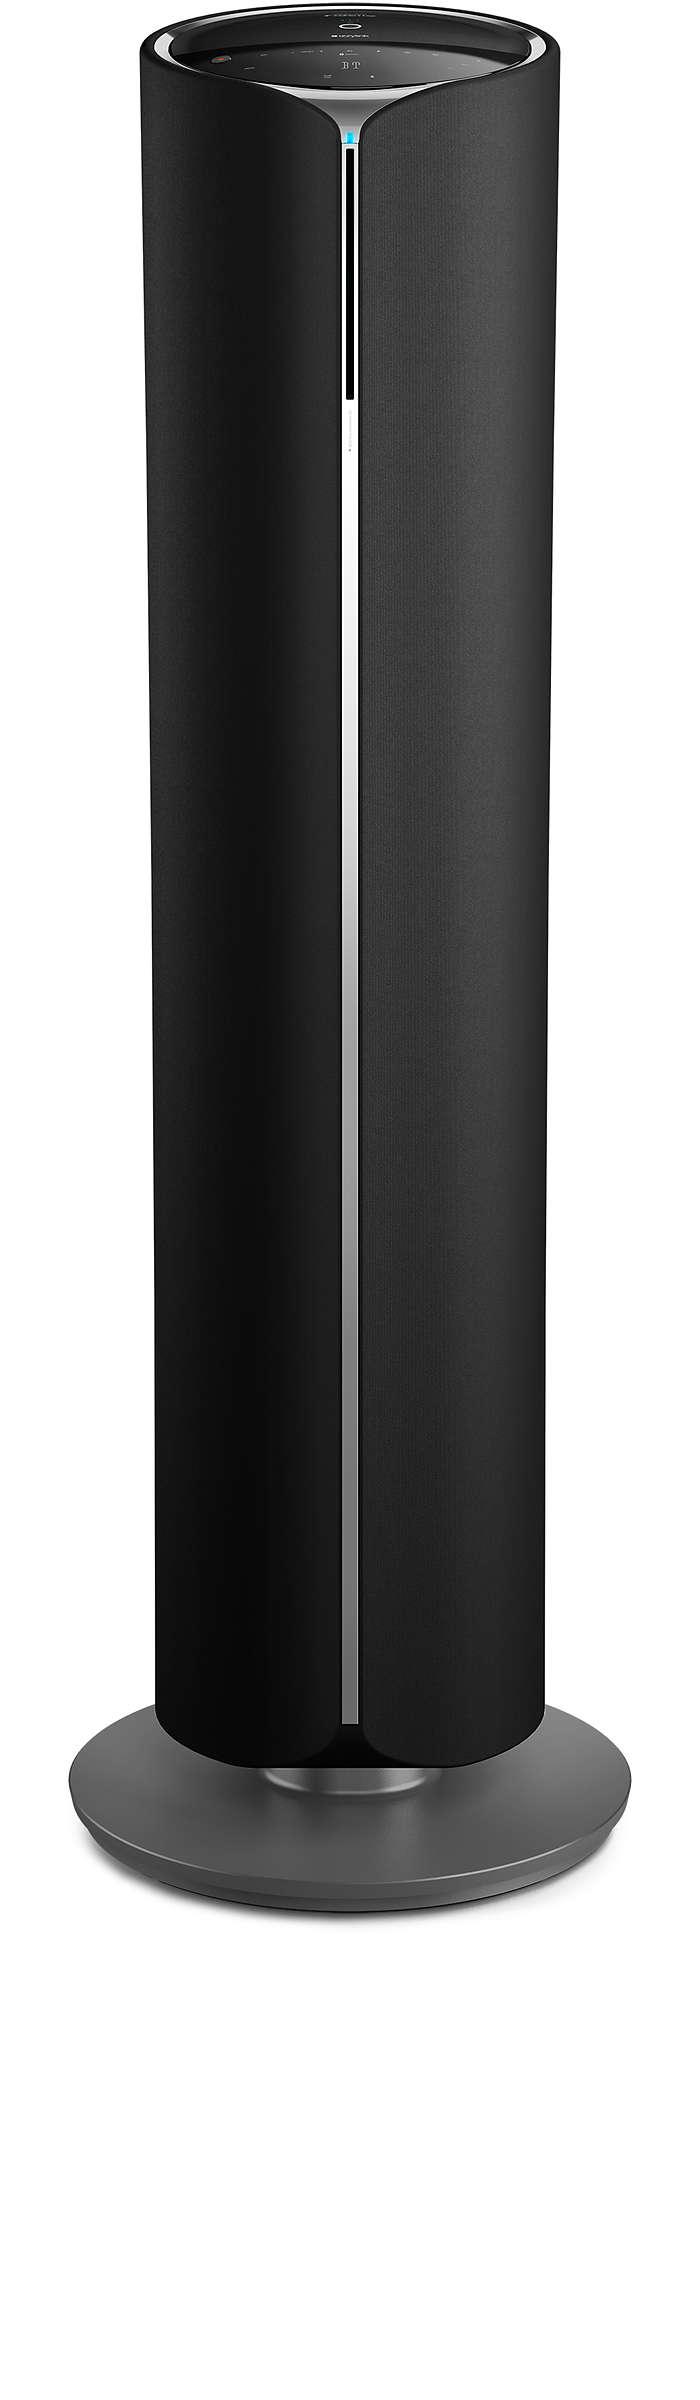 syst me audio sans fil multiroom bm90 12 fidelio. Black Bedroom Furniture Sets. Home Design Ideas